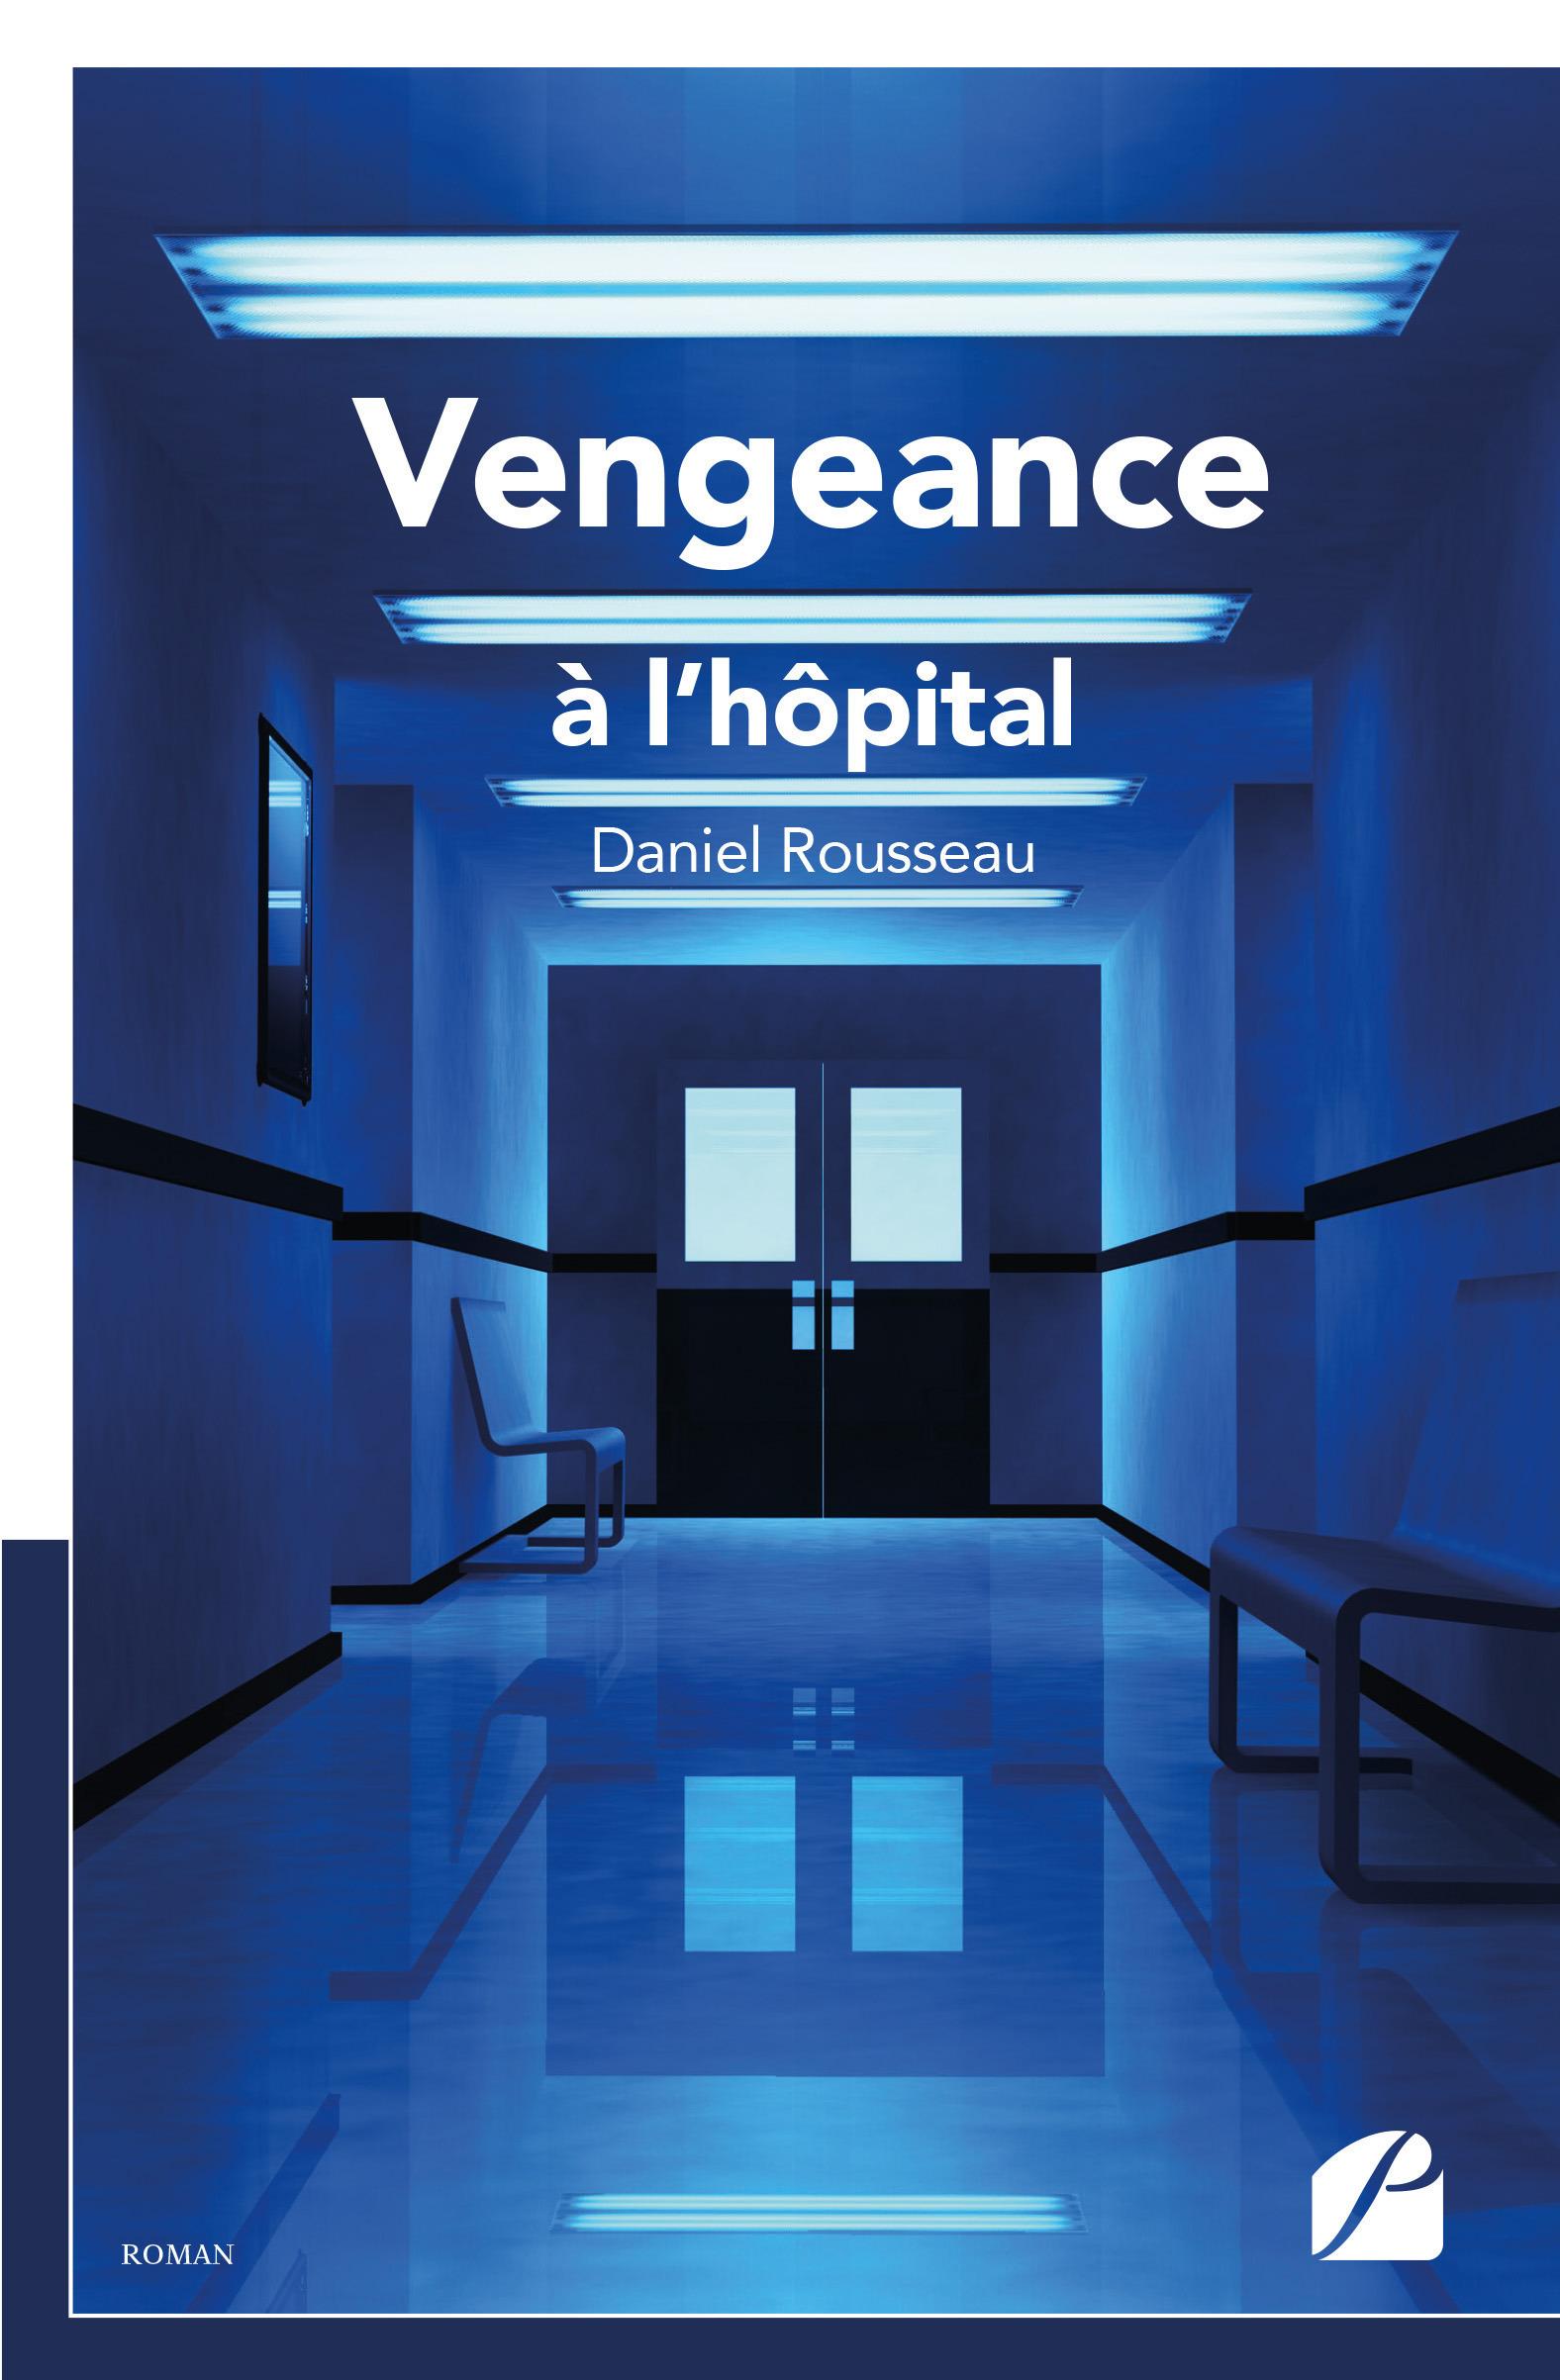 vengeance à l'hôpital